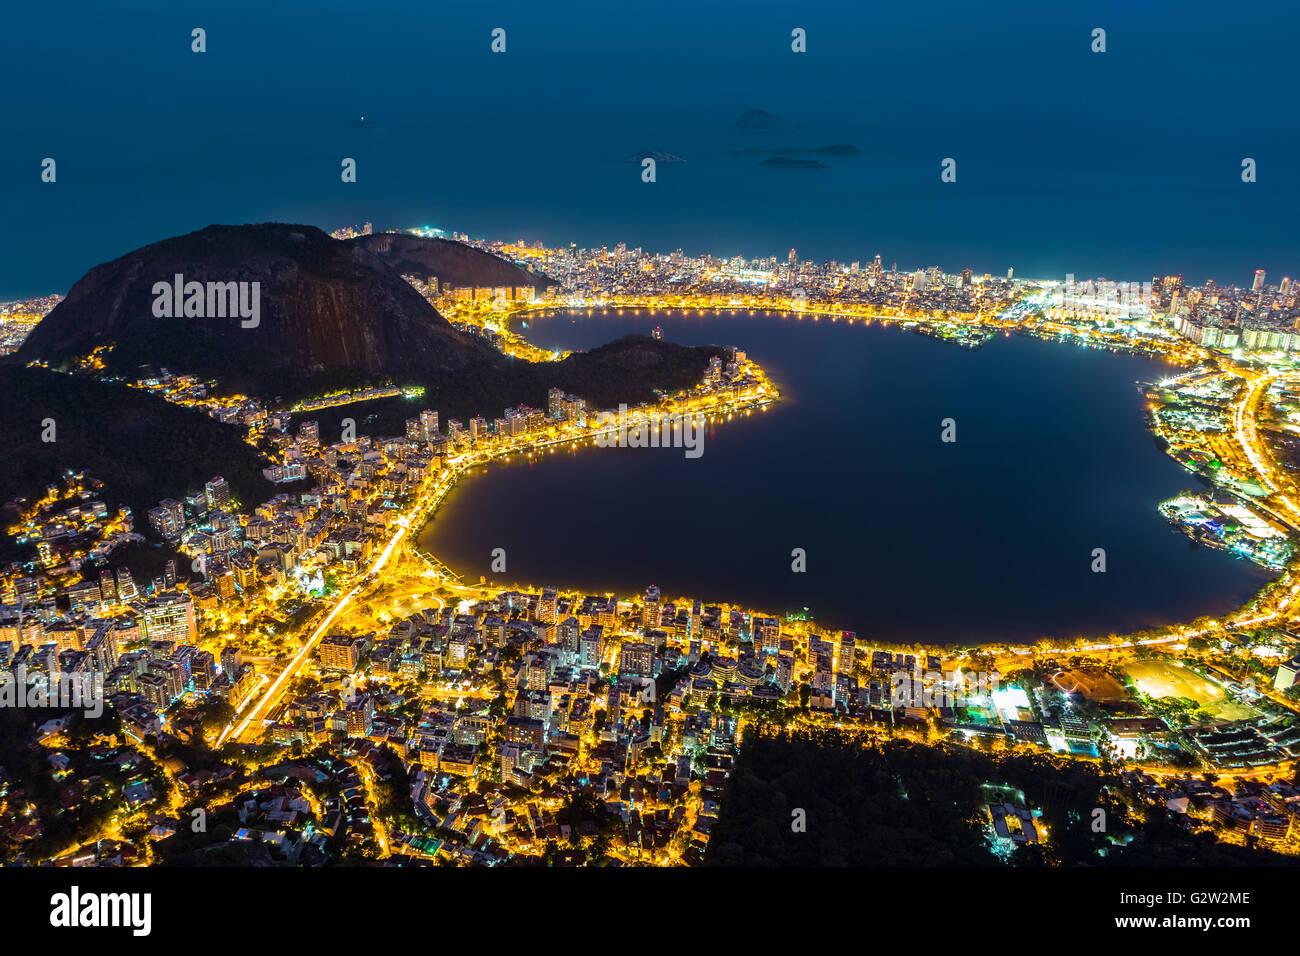 Aerial view of Rio de Janeiro, by night. - Stock Image